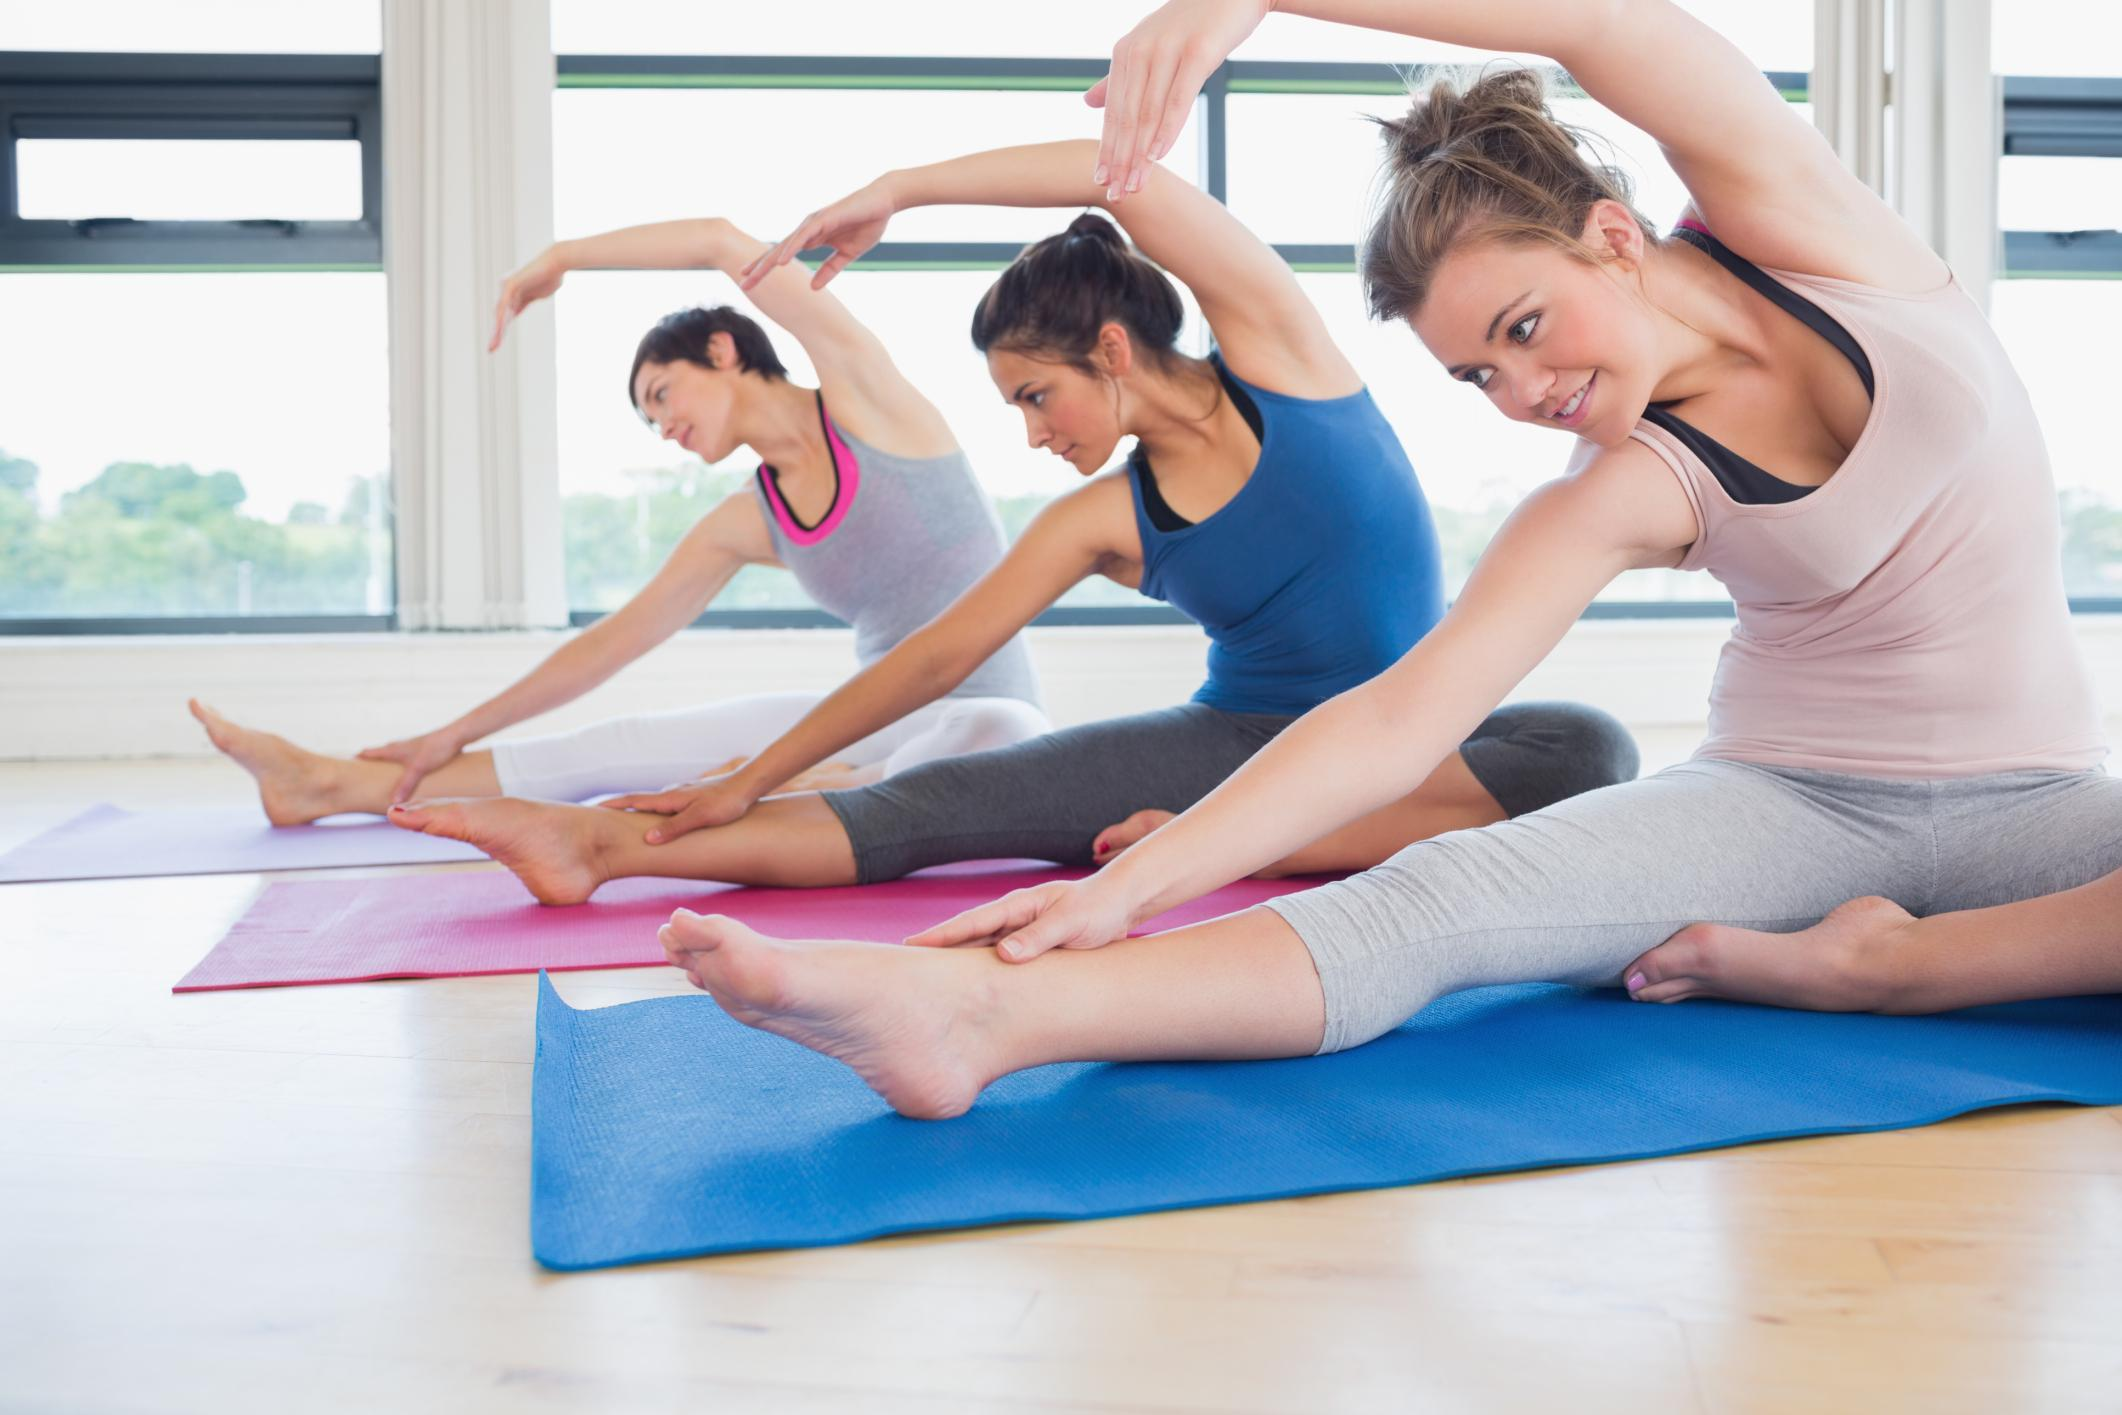 Yoga Equilíbrio Entre Corpo Mente Espírito